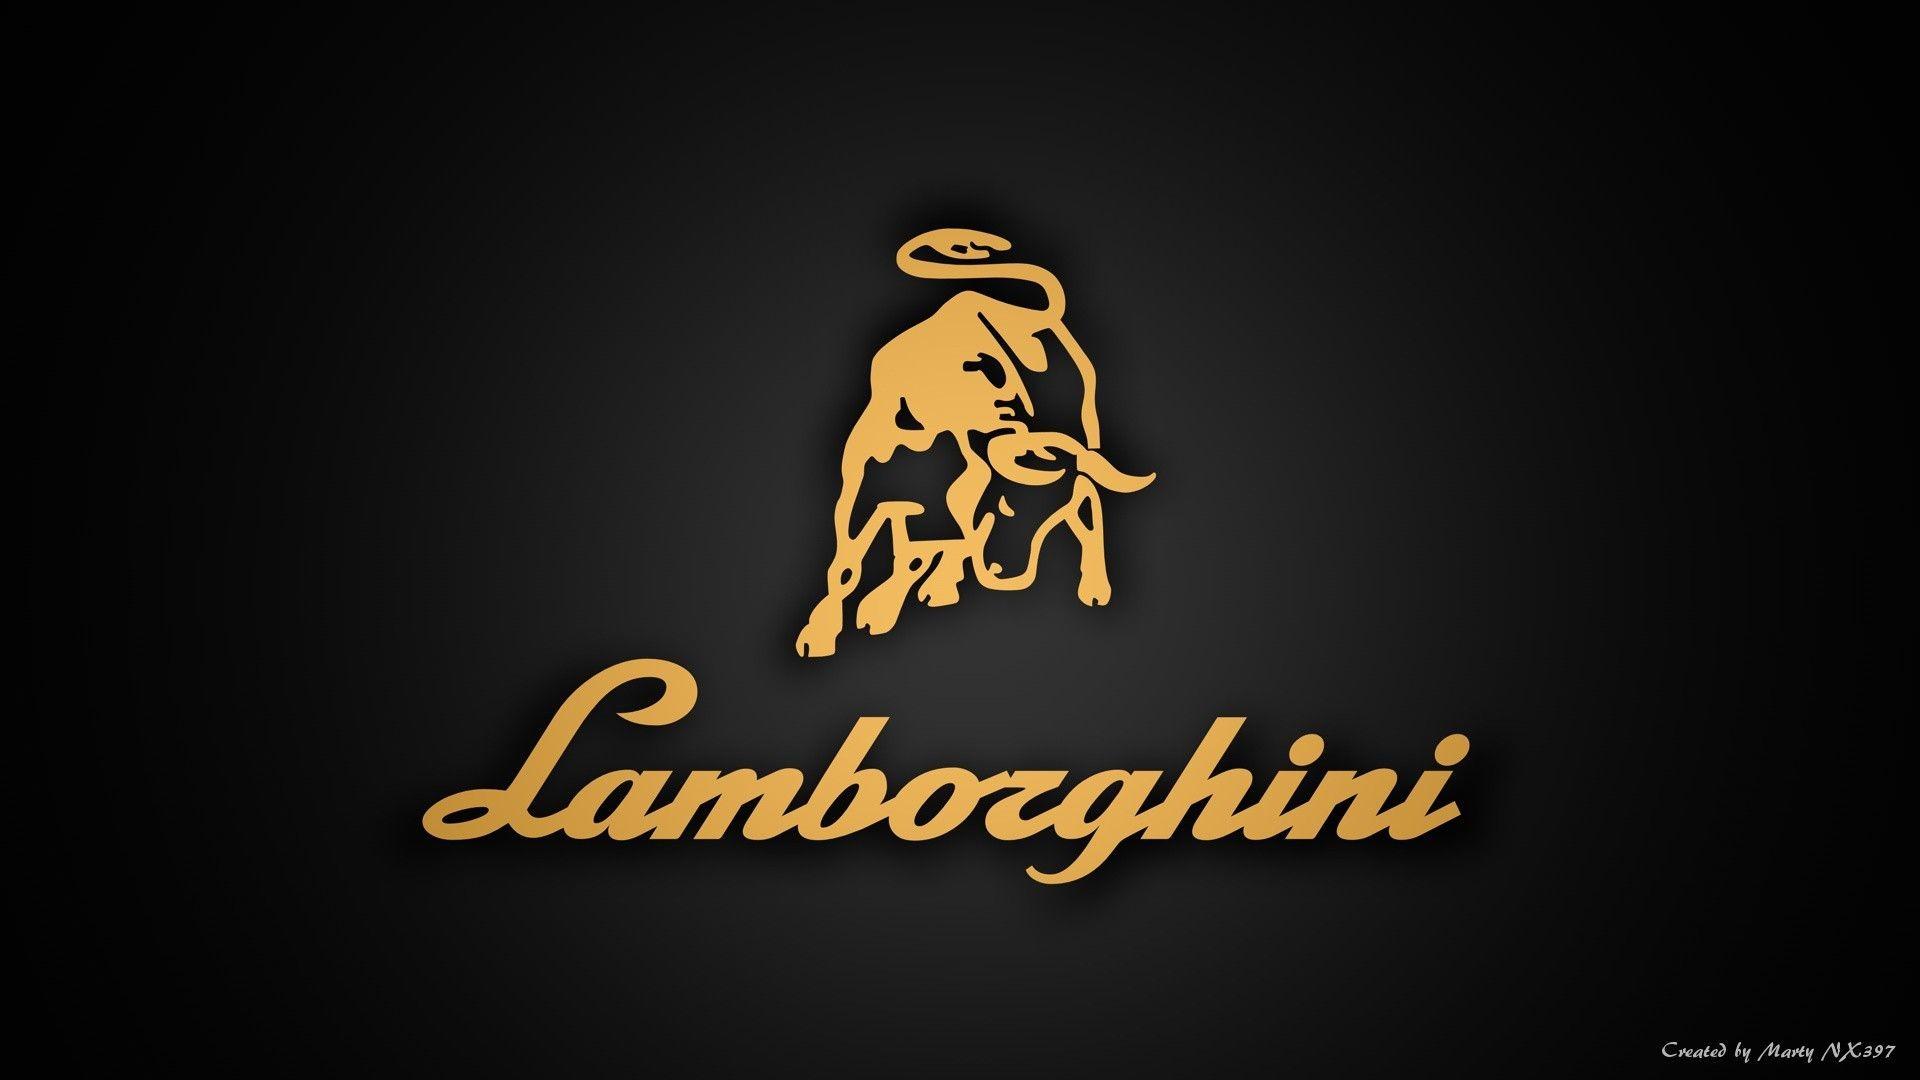 Res: 1920x1080, hd lamborghini logo Pictures Of Cars Hd 640×1136 Lamborghini Logo Wallpaper  (51 Wallpapers